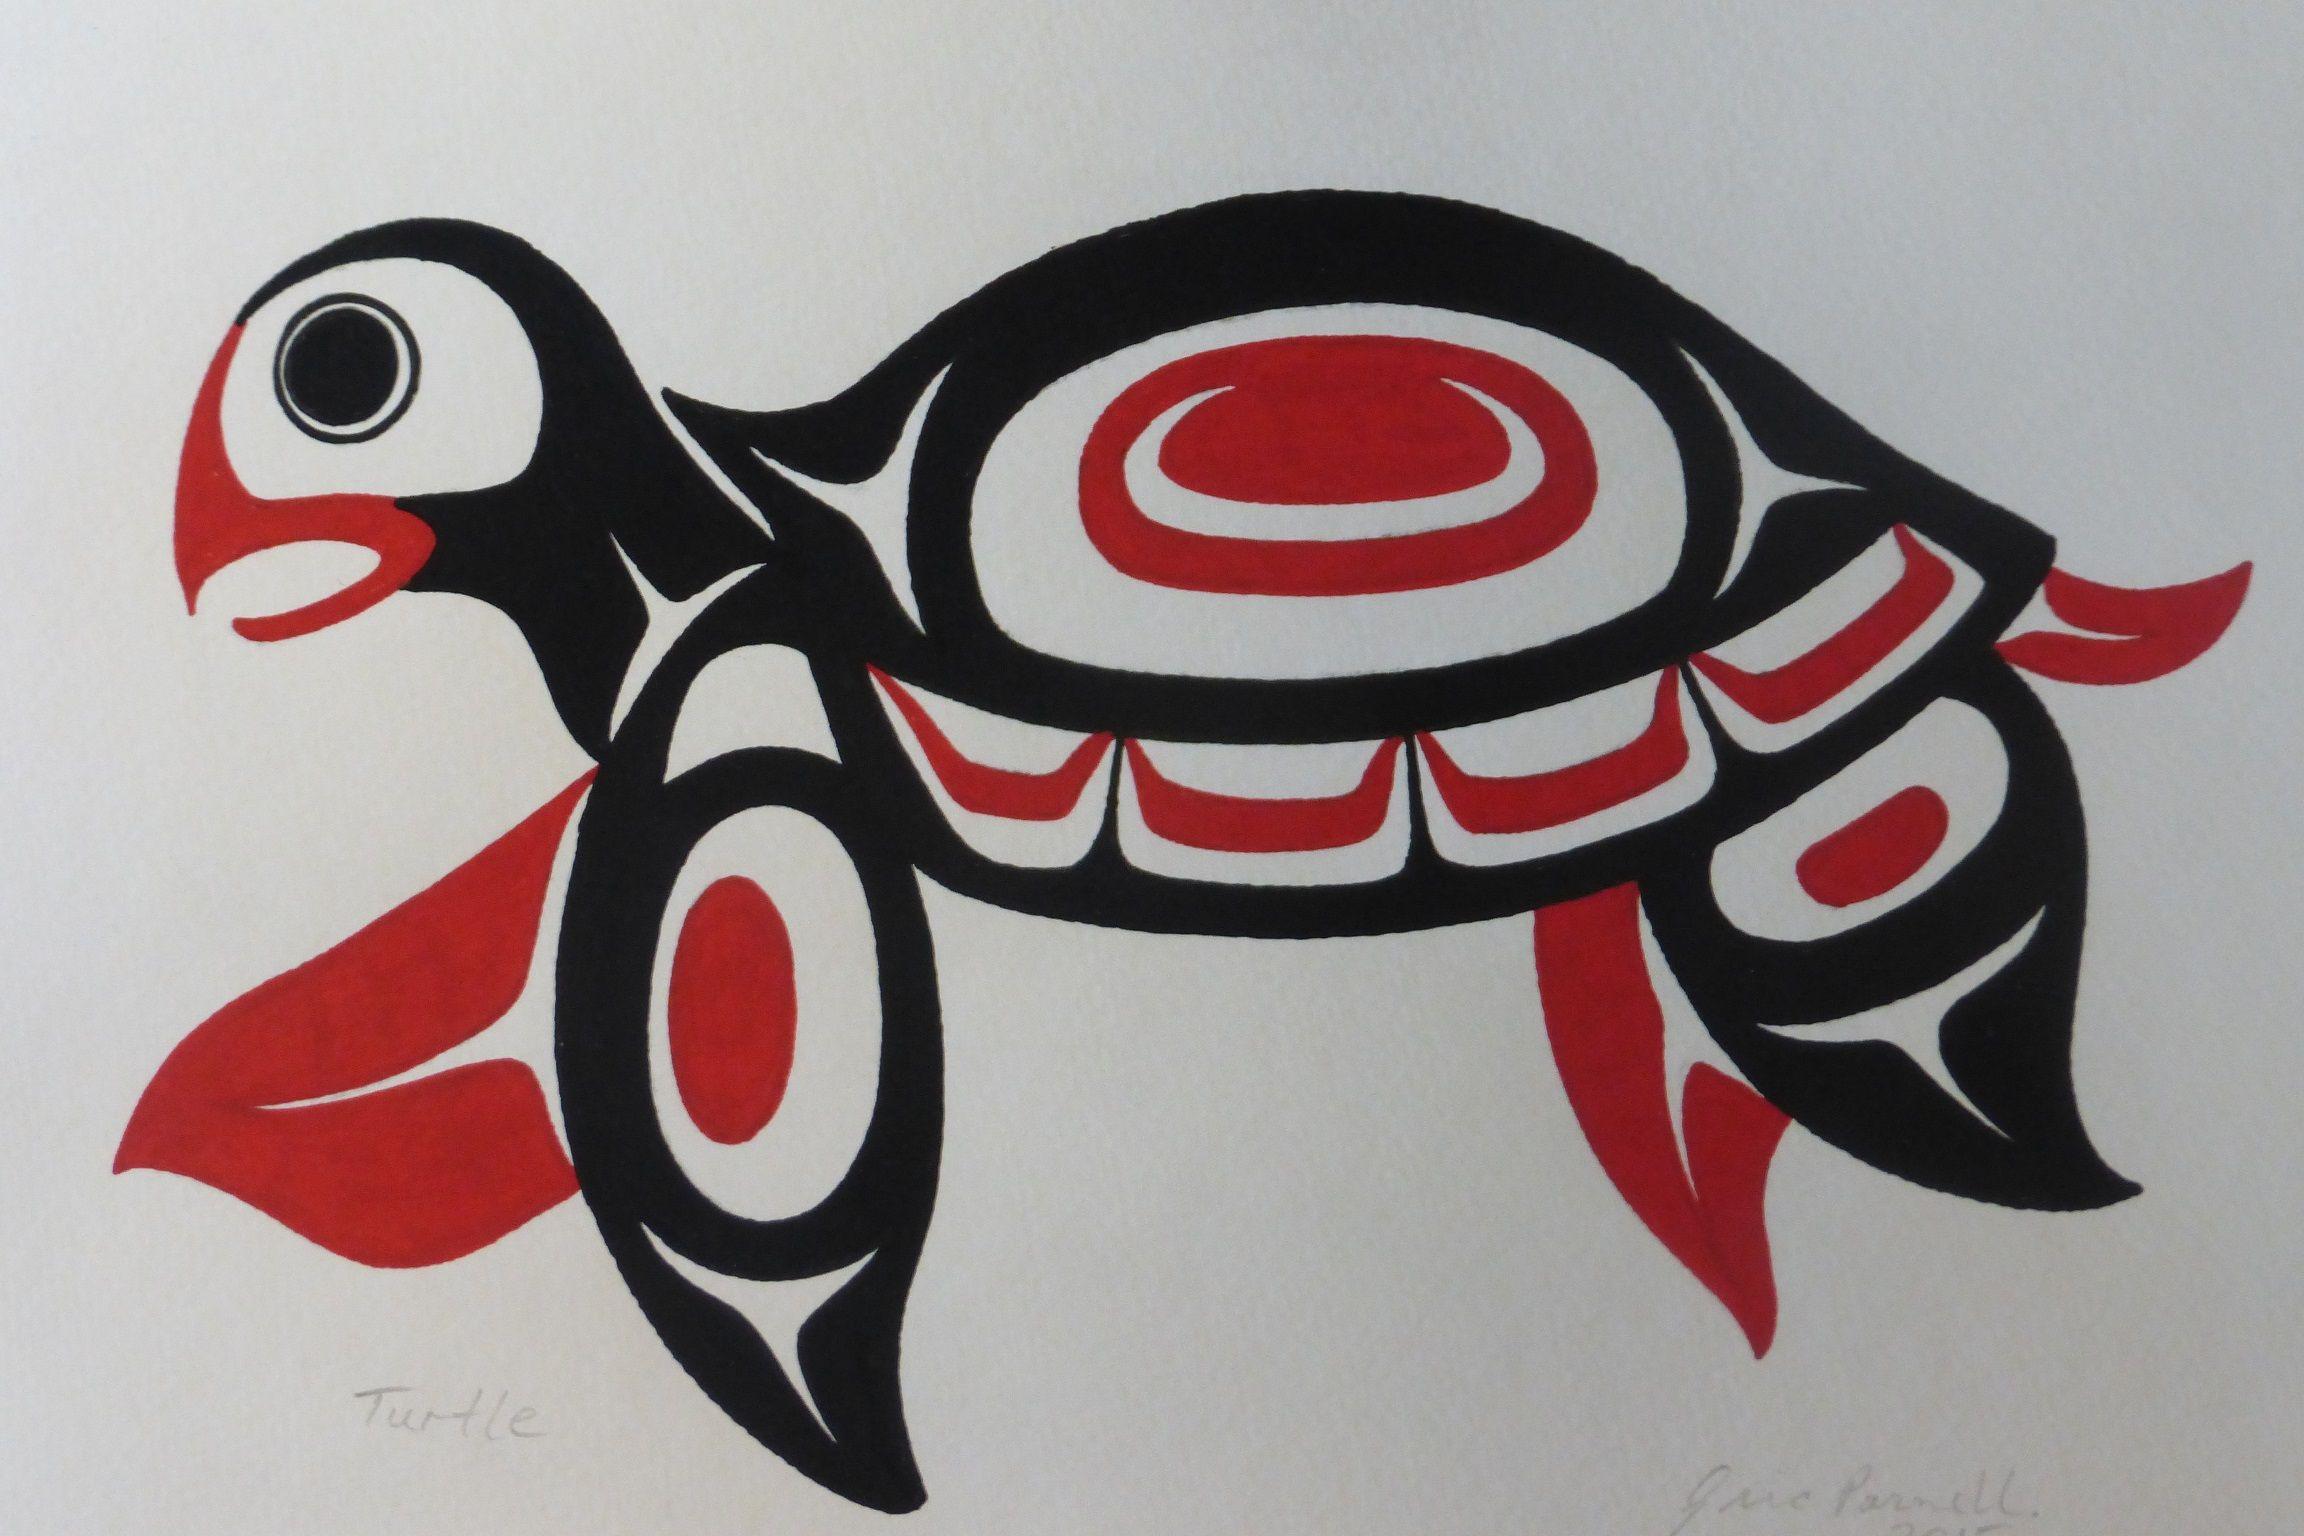 EP PT 50pctsea turtle.jpg (2304×1536)